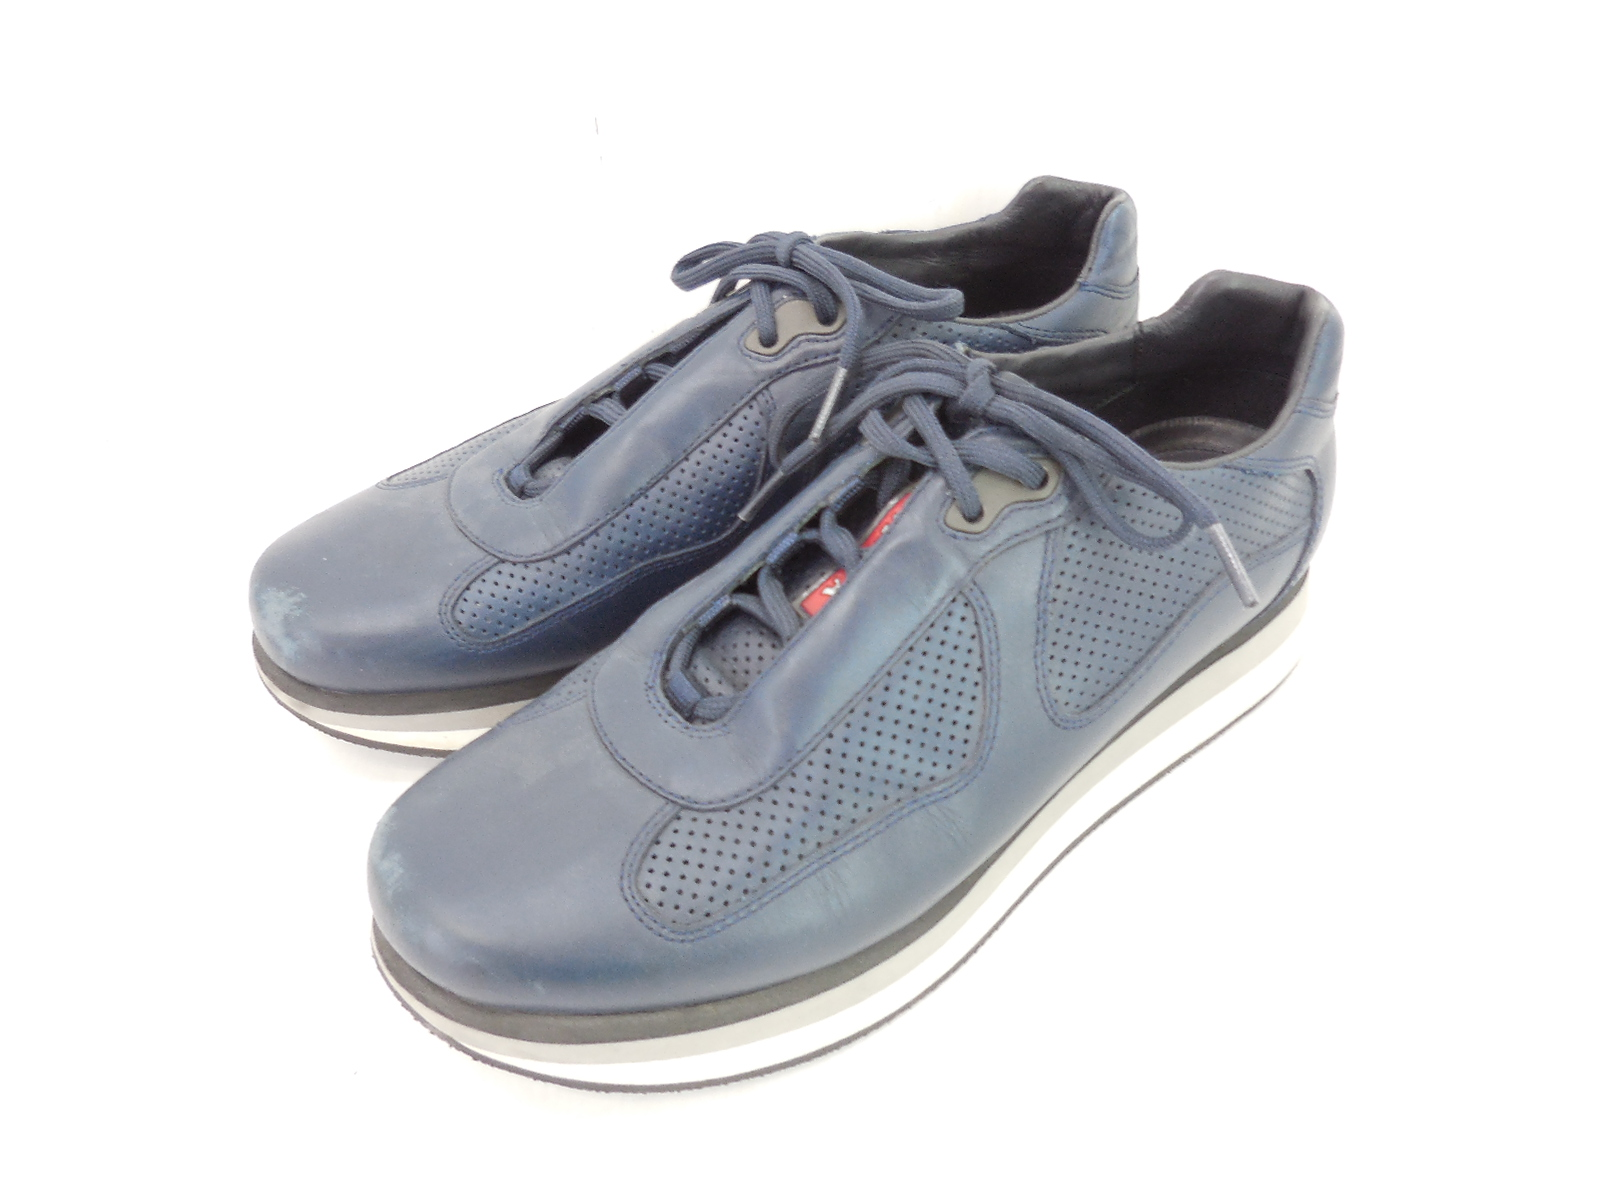 PRADA 2352 レザースニーカー size:9(JP約28cm) プラダ 靴 シューズ ネイビー JSB鑑定済み